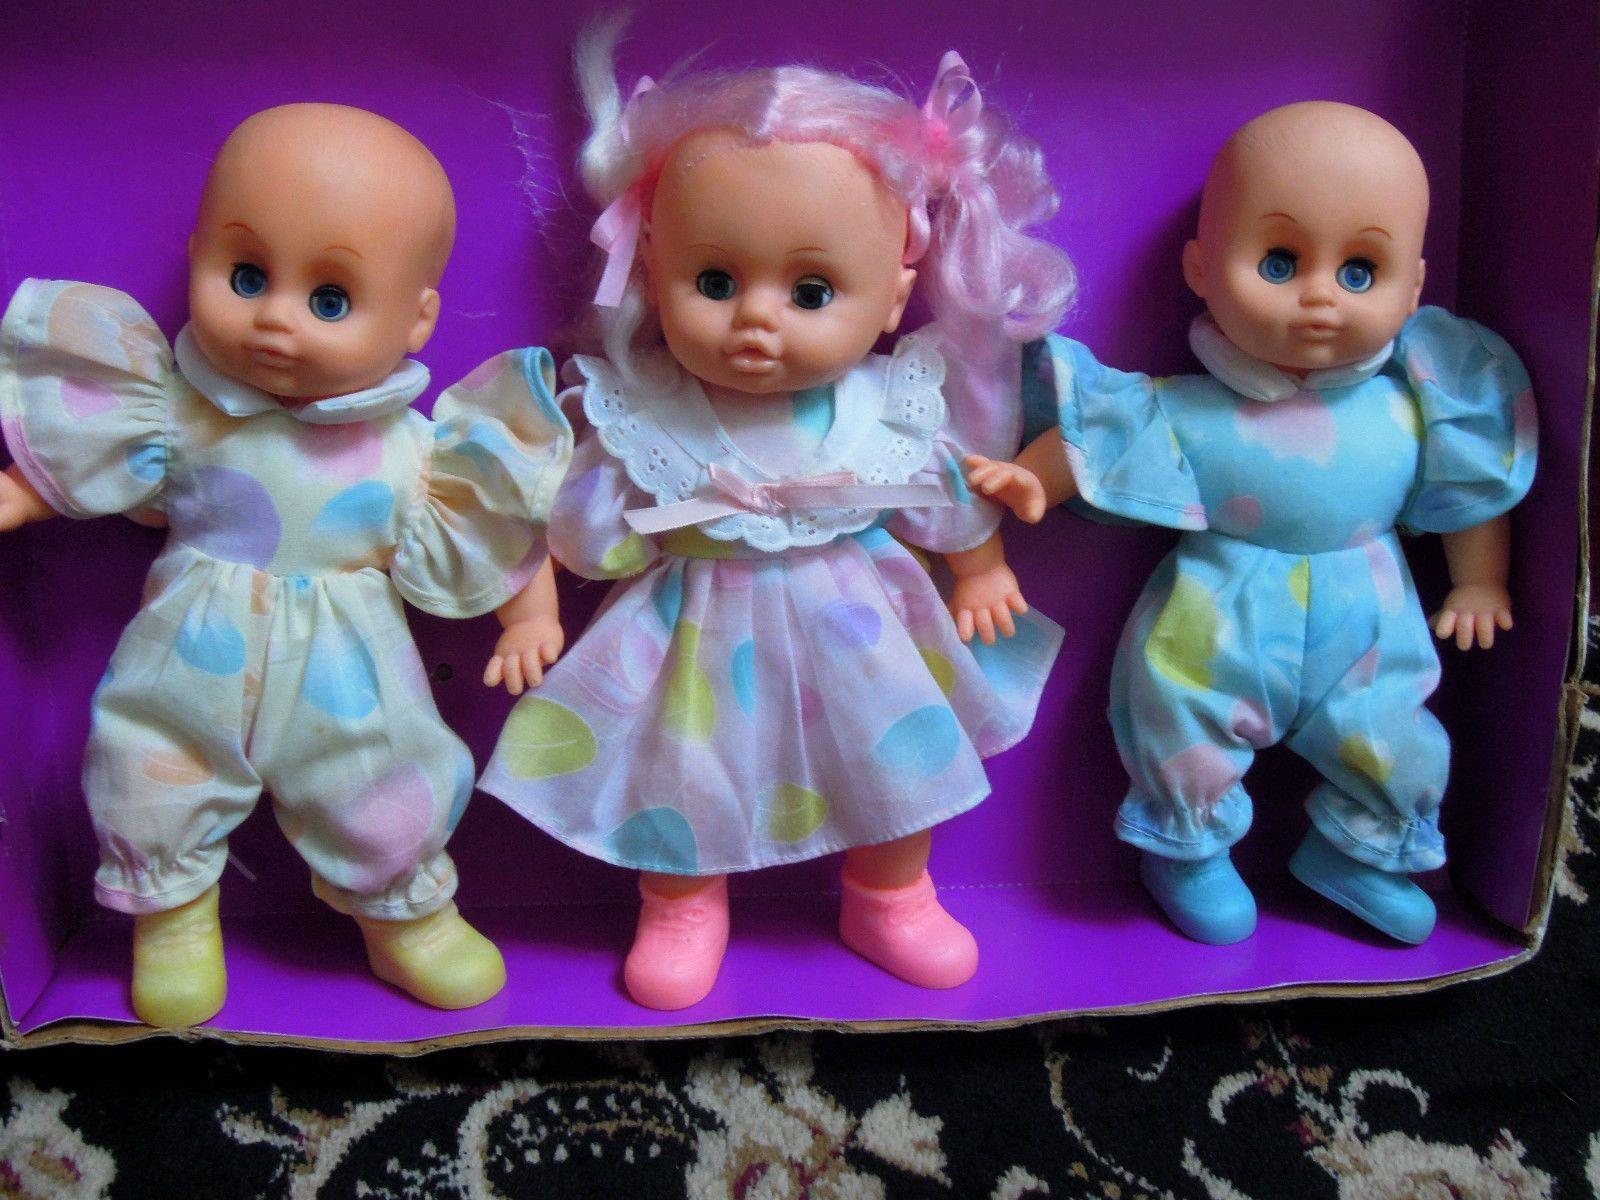 Vintage rare Padgett Brothers 3 baby dolls | eBay